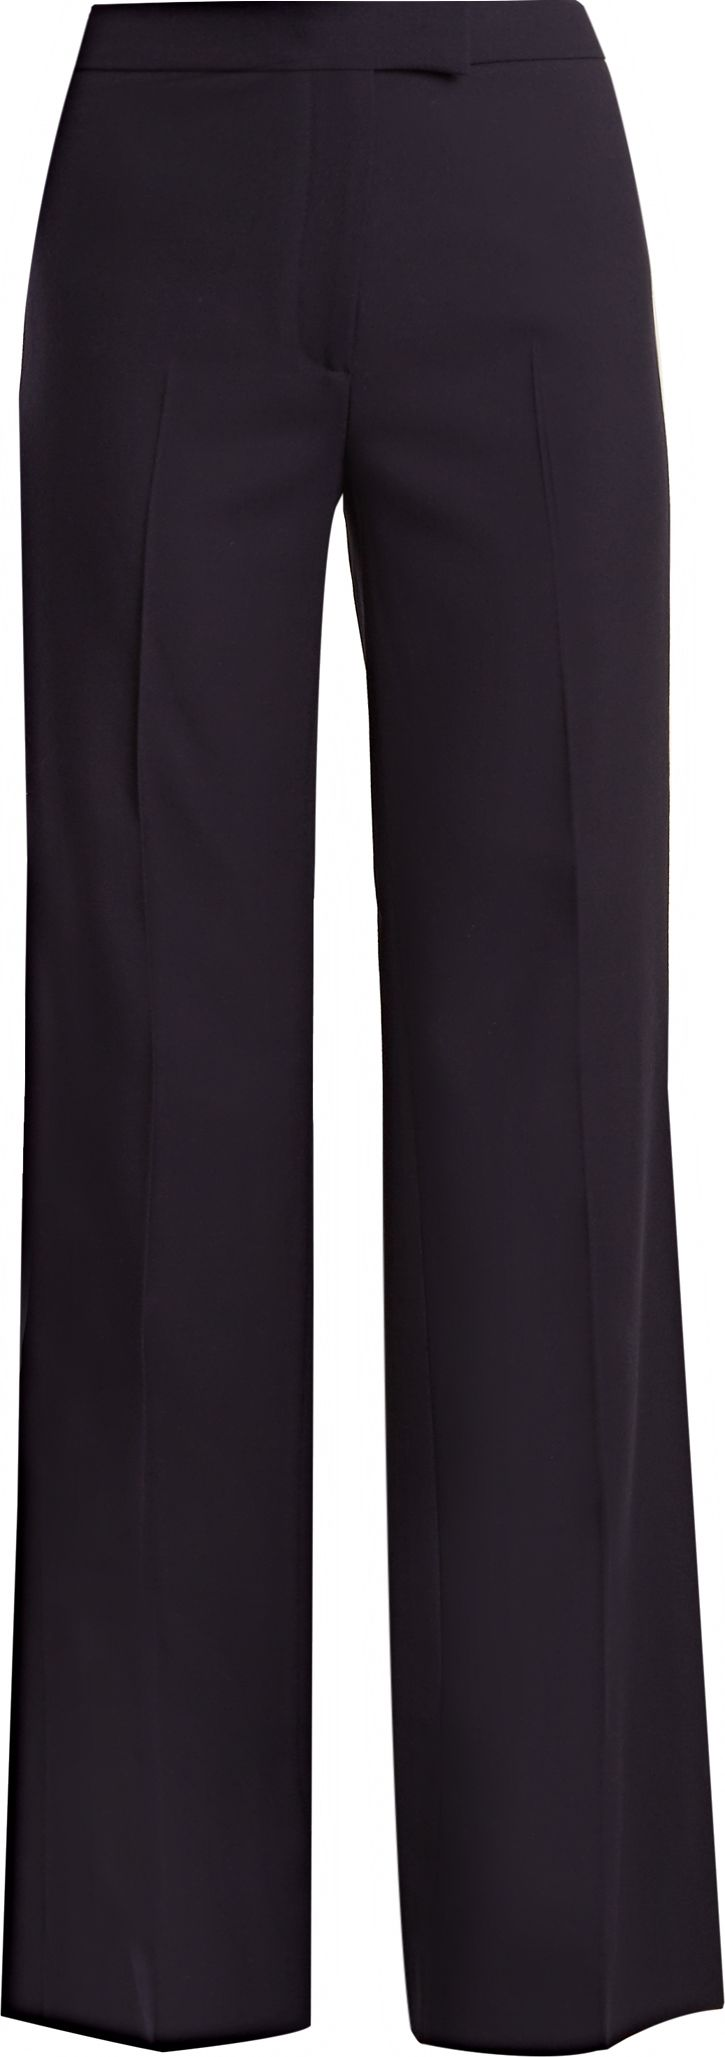 Alexachung - High-waisted wide-leg wool trousers